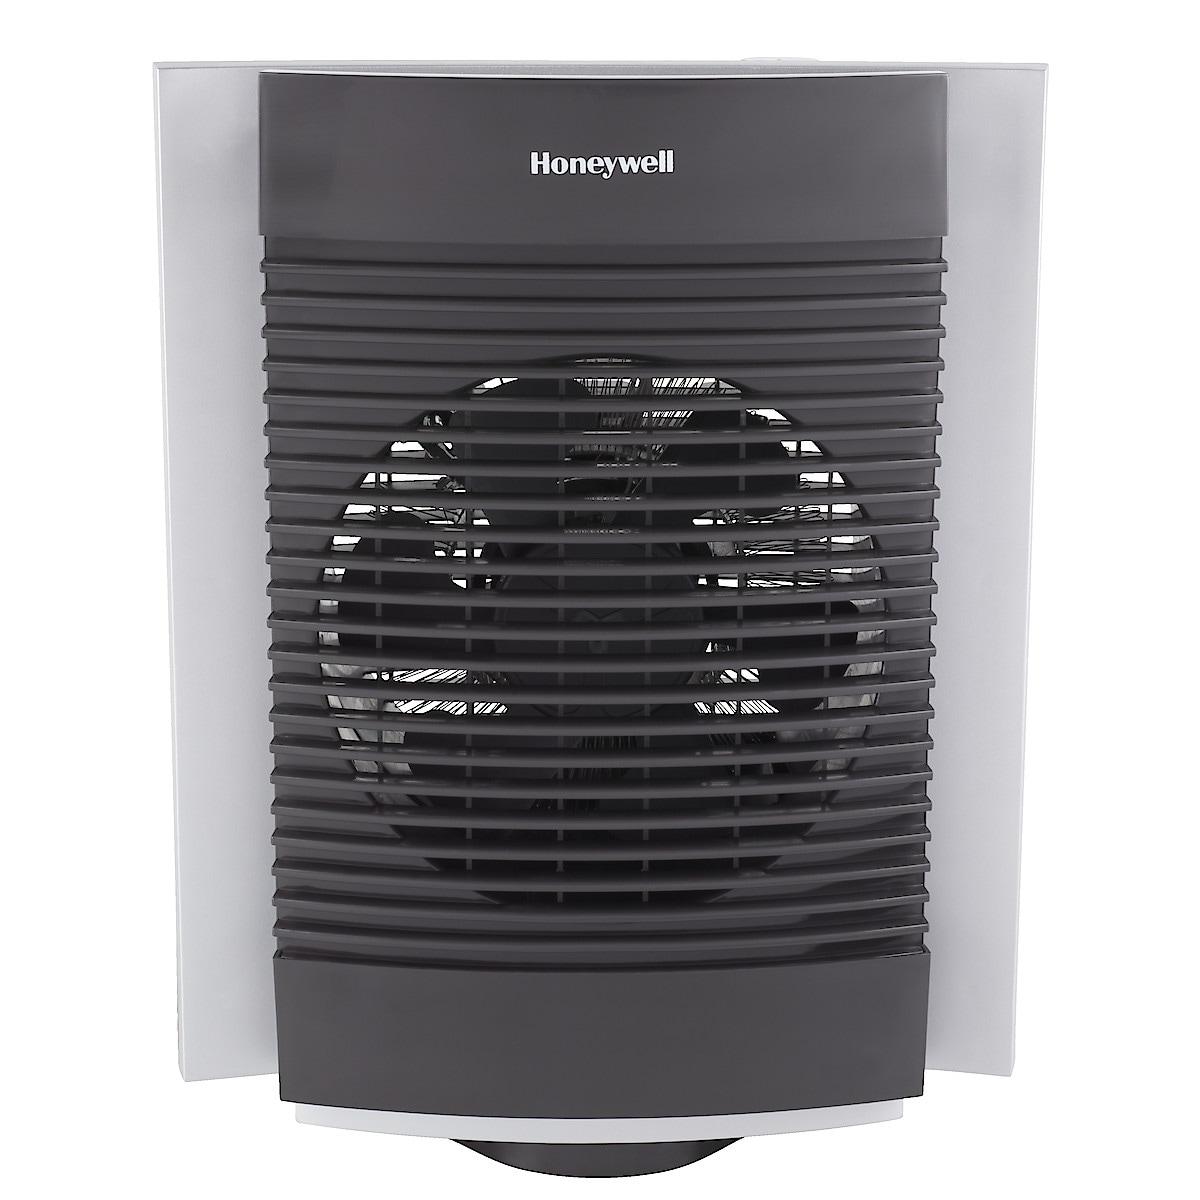 Värmefläkt Honeywell HZ-500E